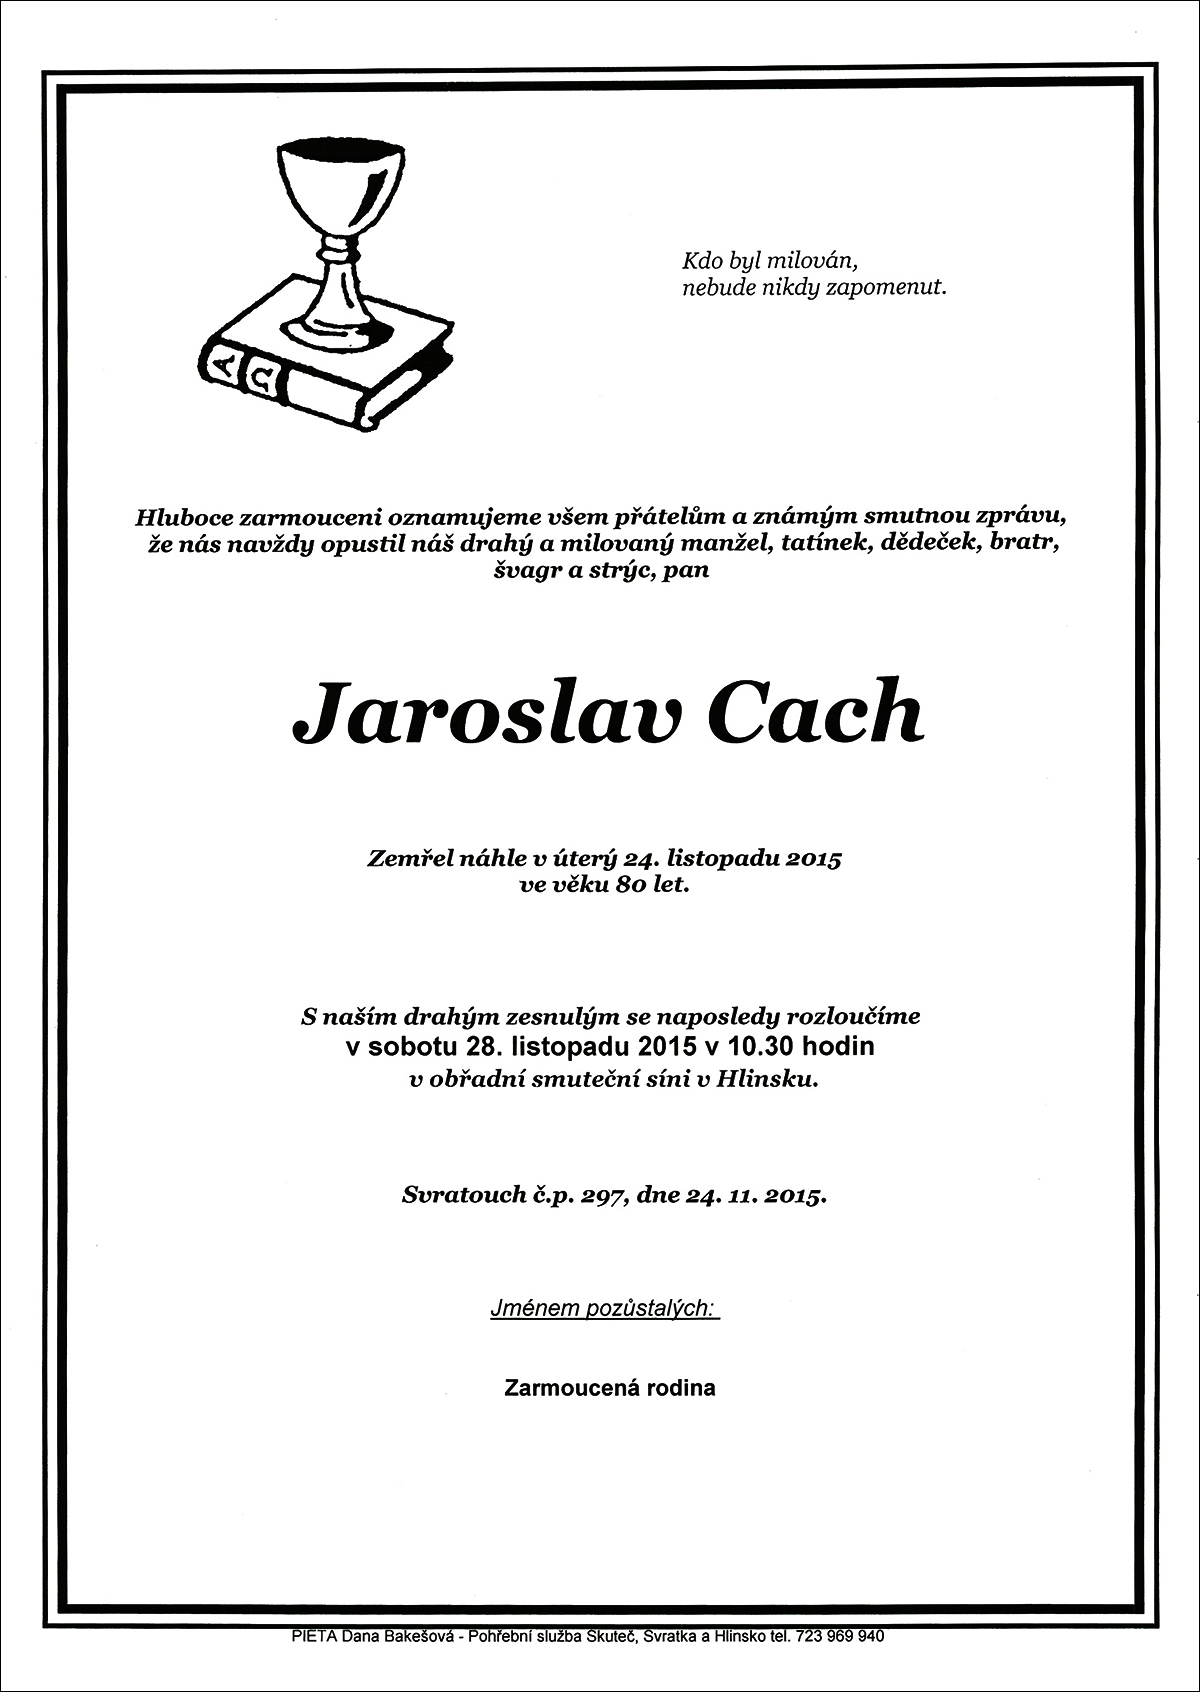 Jaroslav Cach